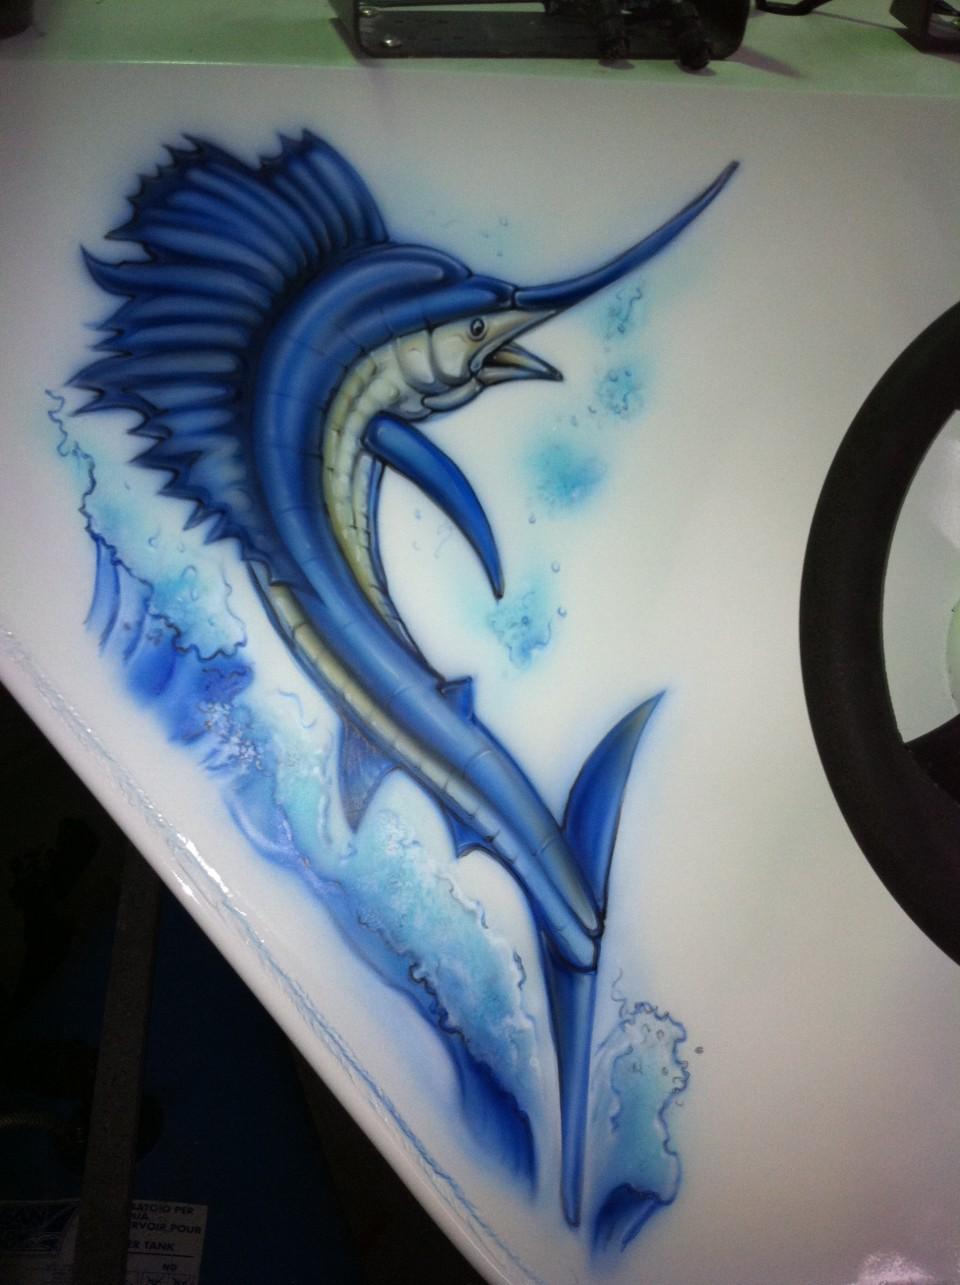 airbrush-boat-airbrush-art- airbrush-sail-fish1